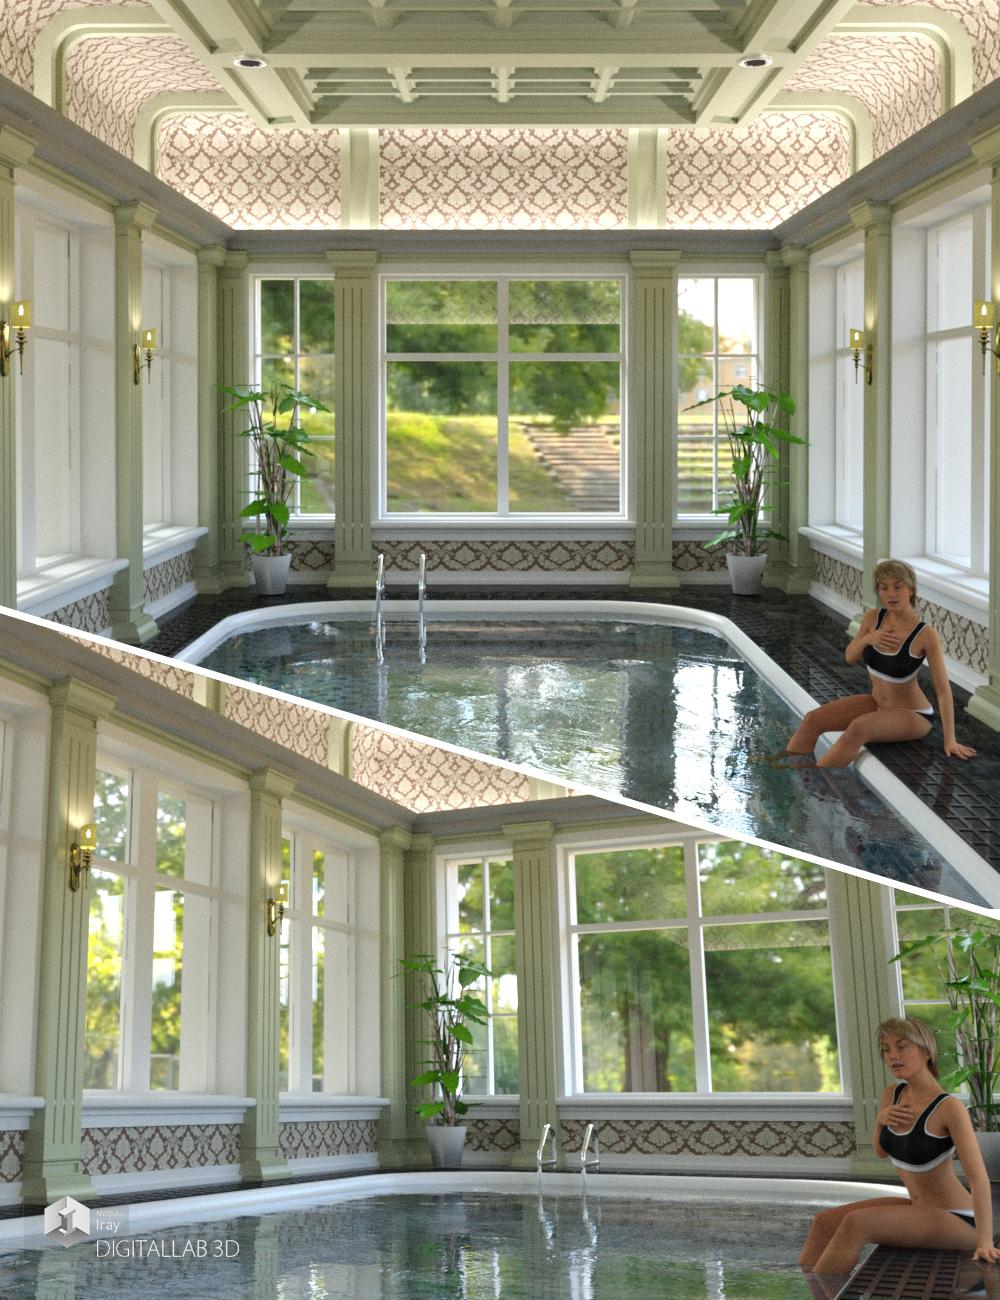 Bel Air Pool by: Digitallab3D, 3D Models by Daz 3D